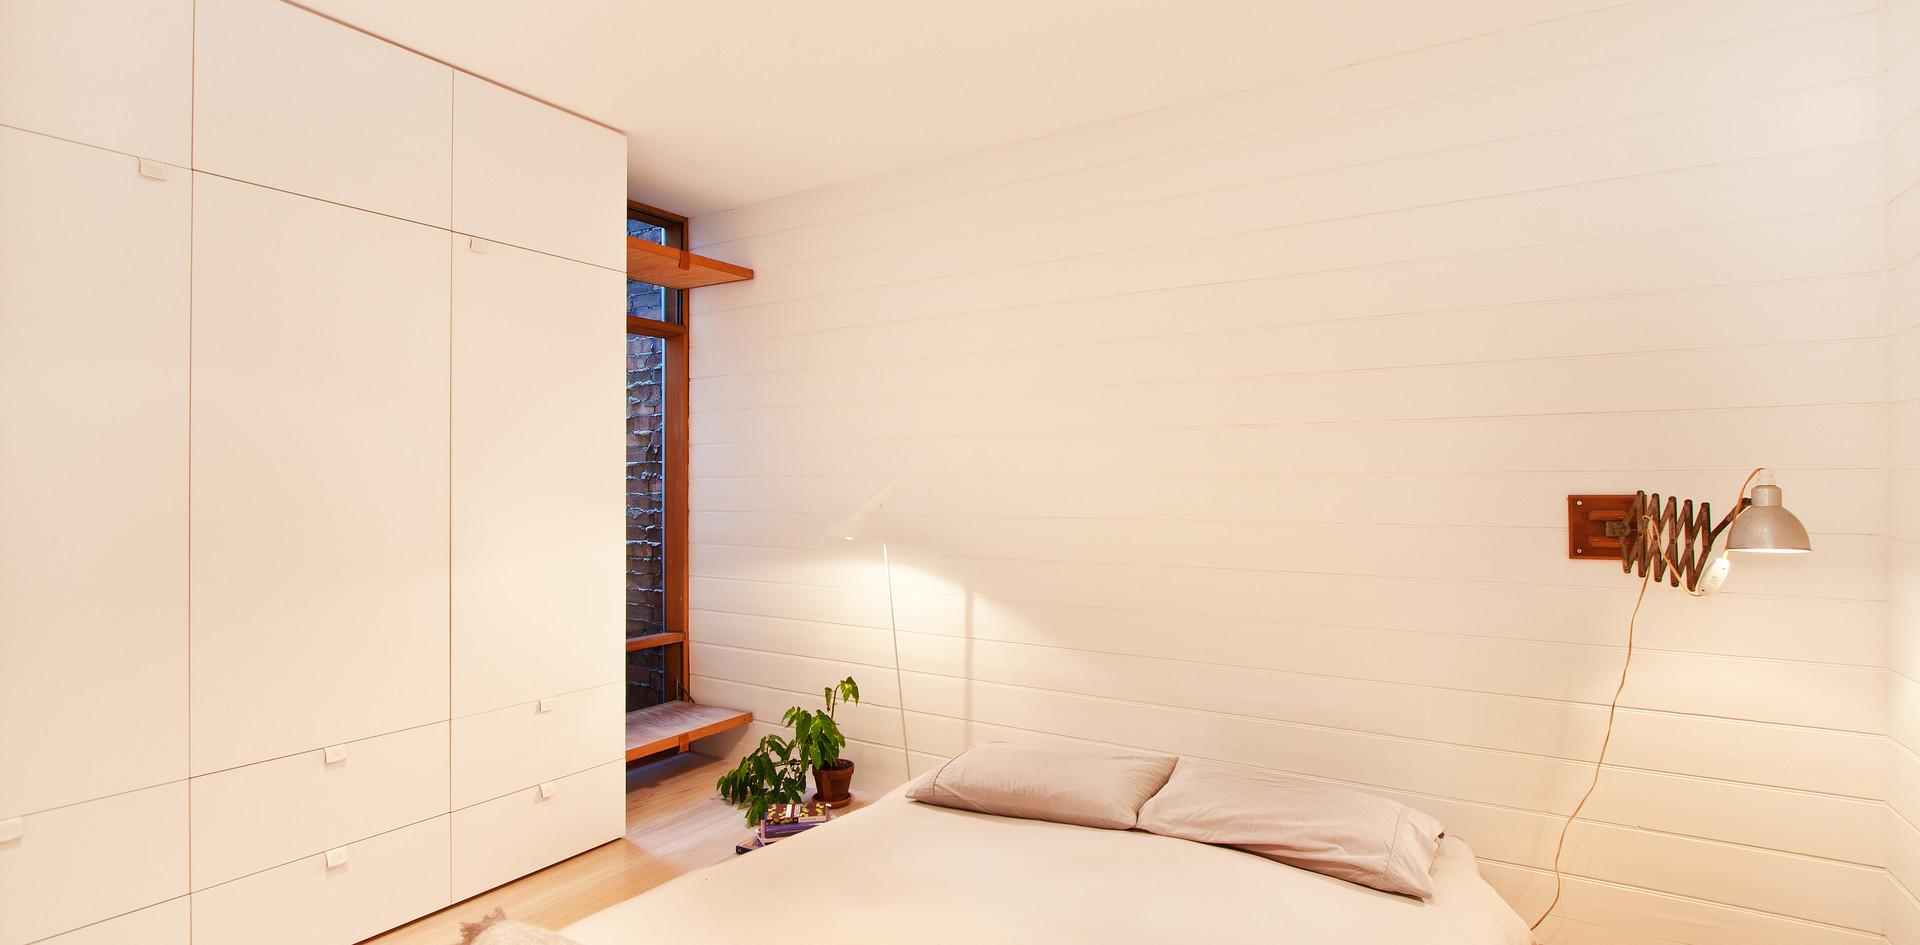 motte bedroom 11.jpeg